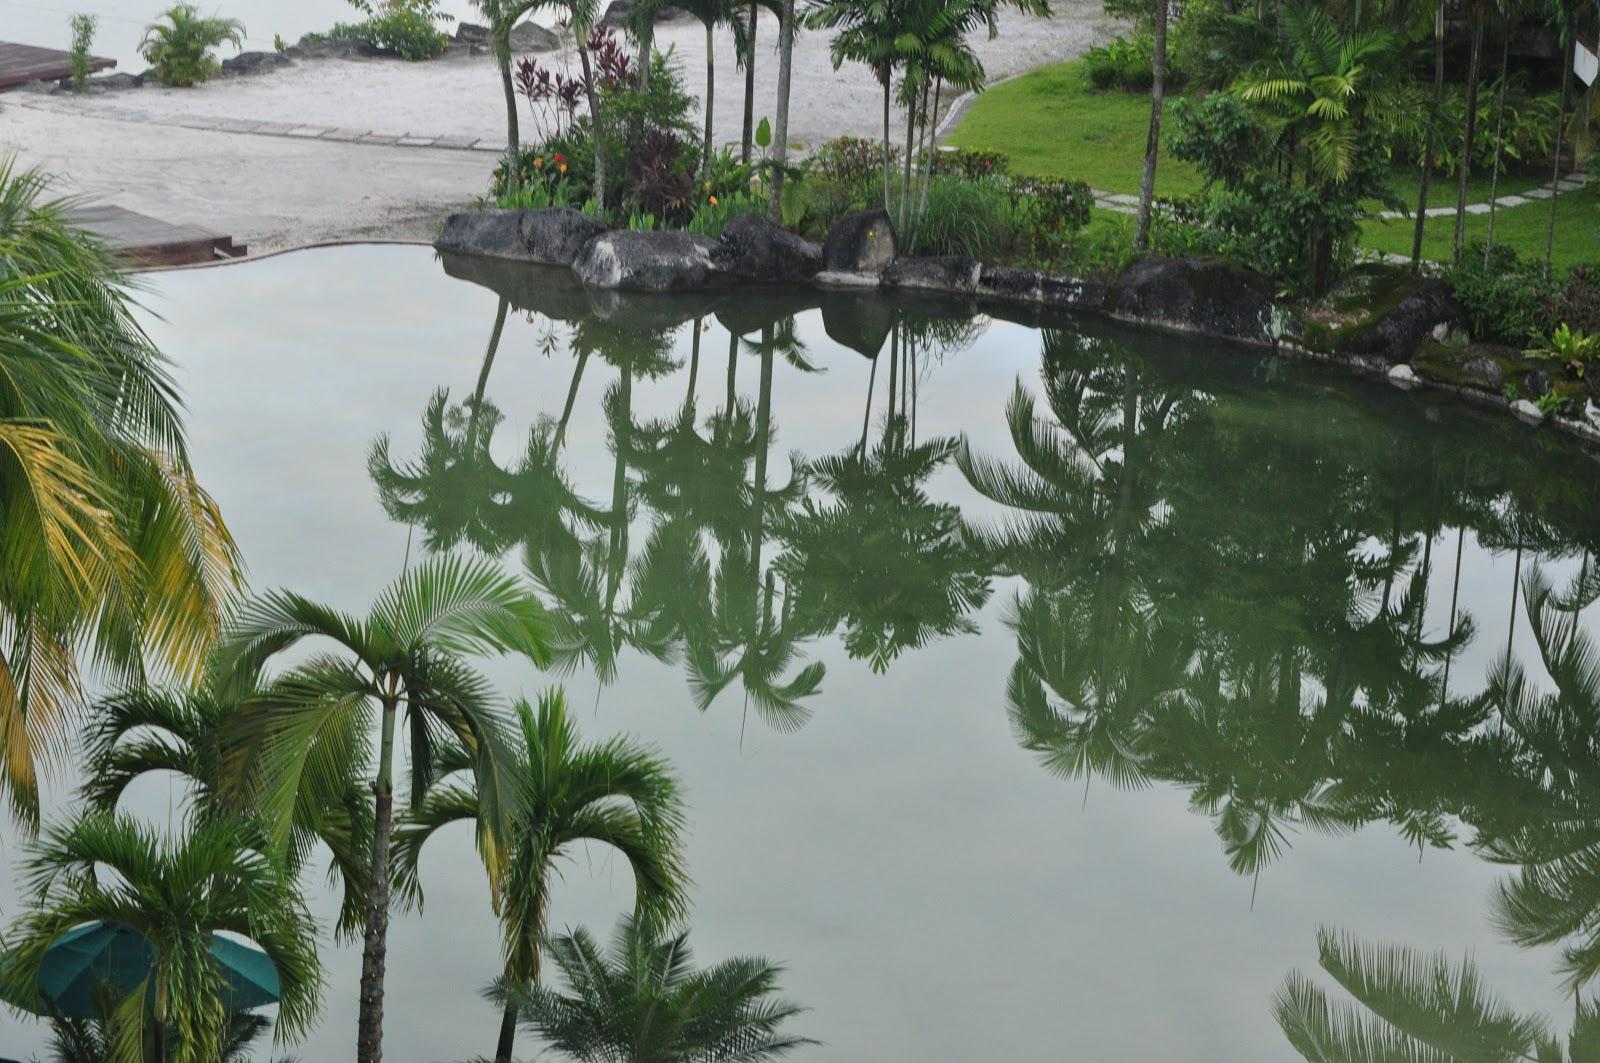 mines wellness hotel The mines jalan dulang, mines resort city, seri kembangan, 43300 selangor  darul ehsan, malaysia getting here capitaland mall asia | capitamalls.